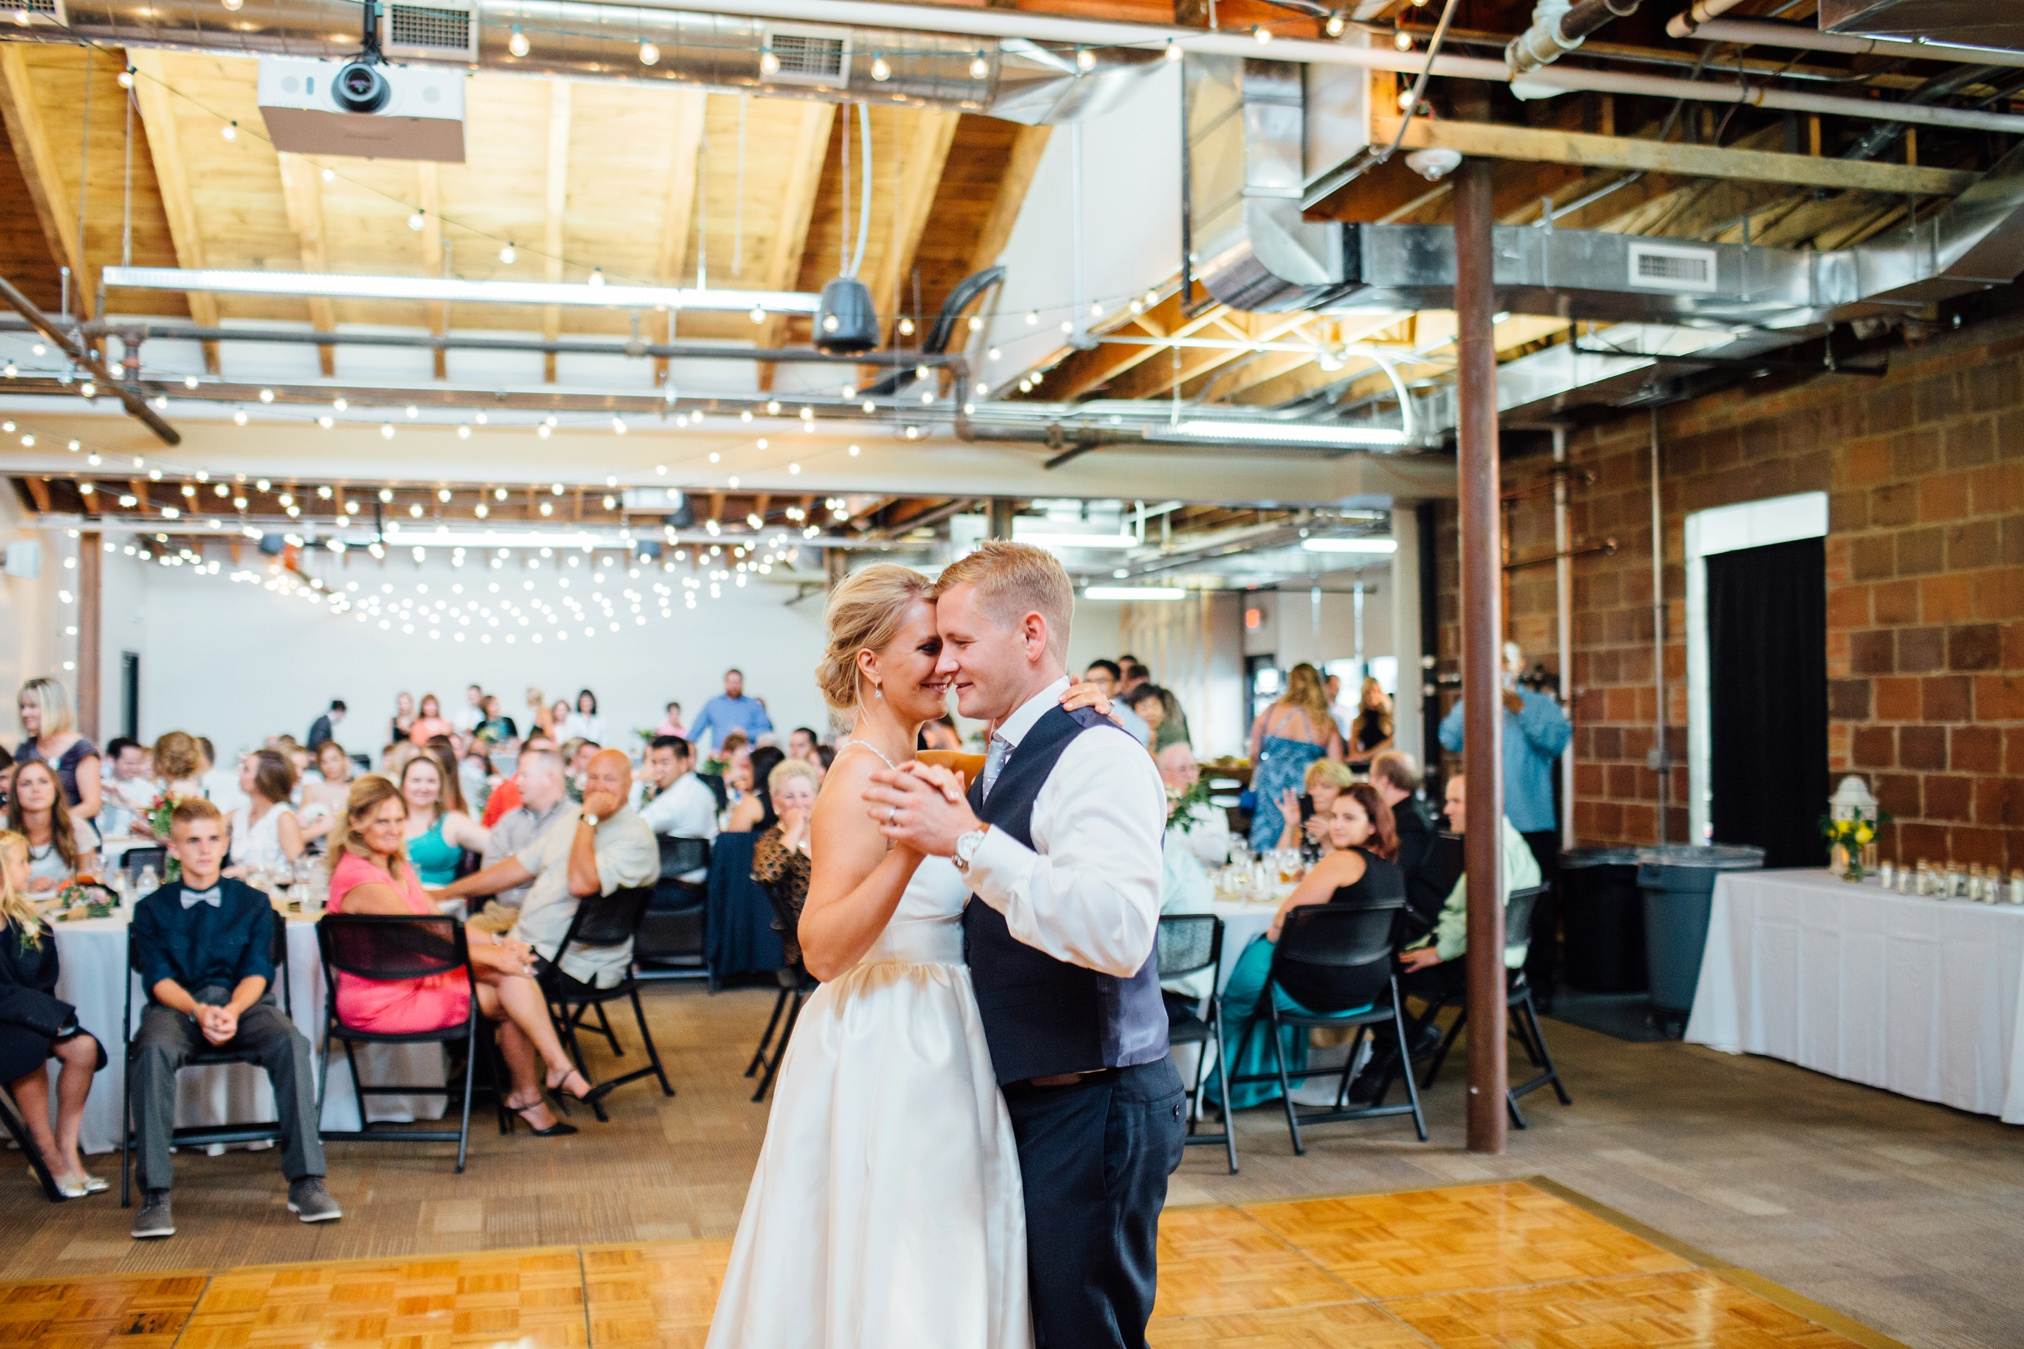 brenna+michael_wedding-705.jpg